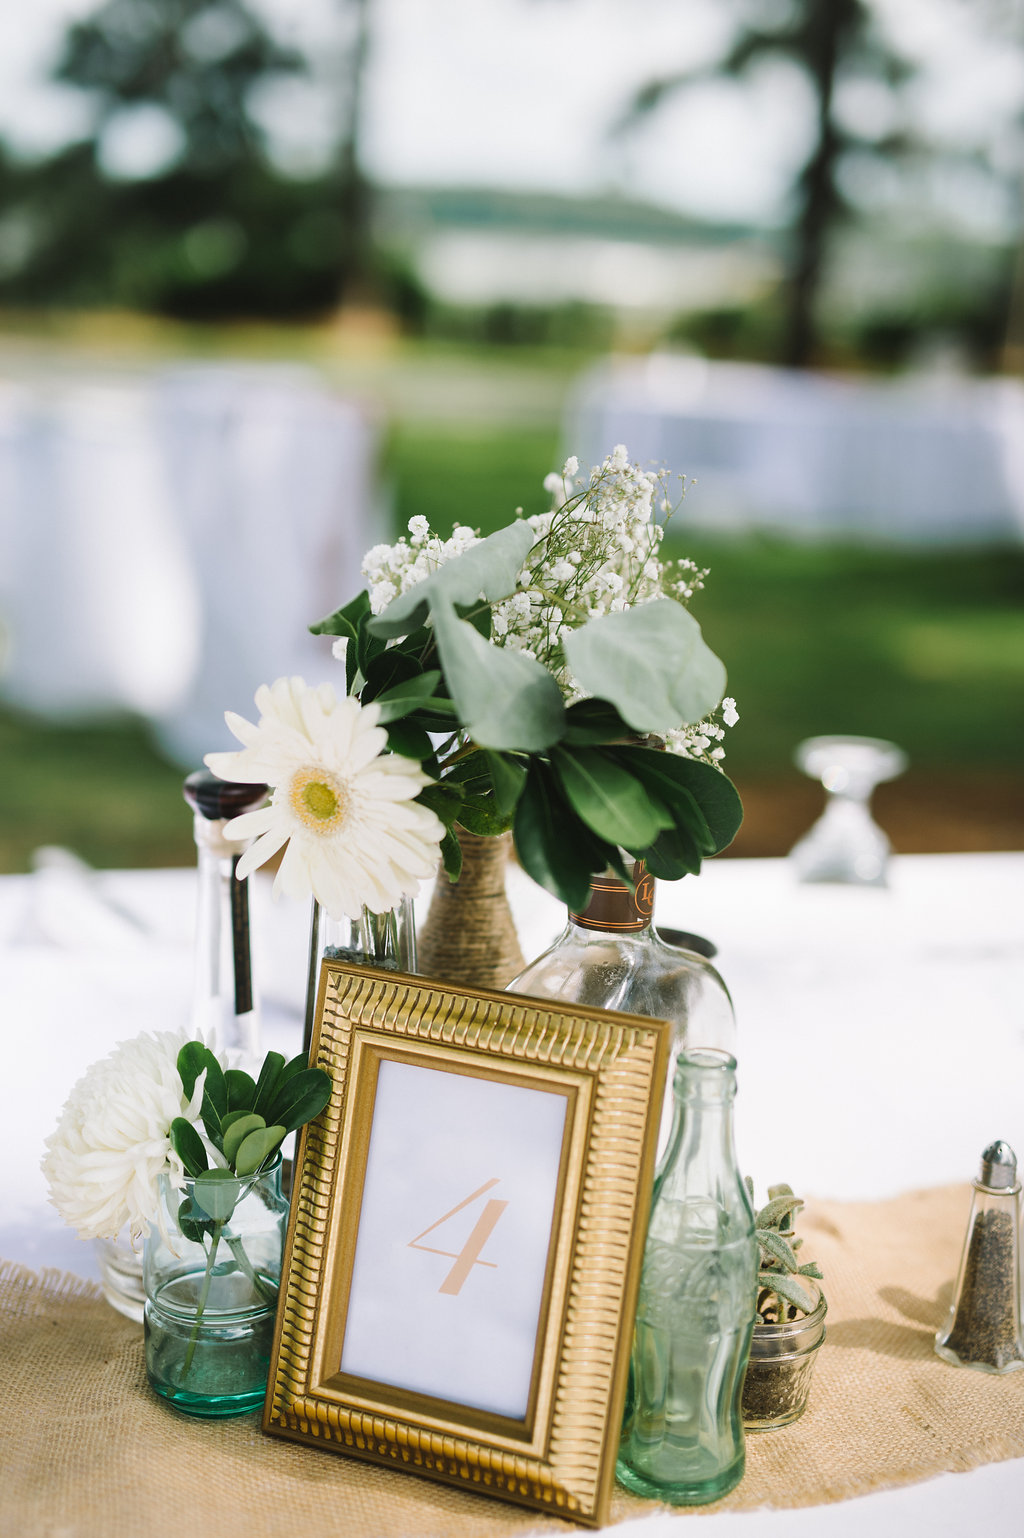 meagan-and-brenden-rach-loves-troy-photography-ivory-and-beau-bridal-boutqiue-ti-adora-wedding-dress-gold-lace-wedding-dress-savannah-wedding-planner-savannah-weddings-oldfield-plantation-wedding-savannah-florist-38.jpg